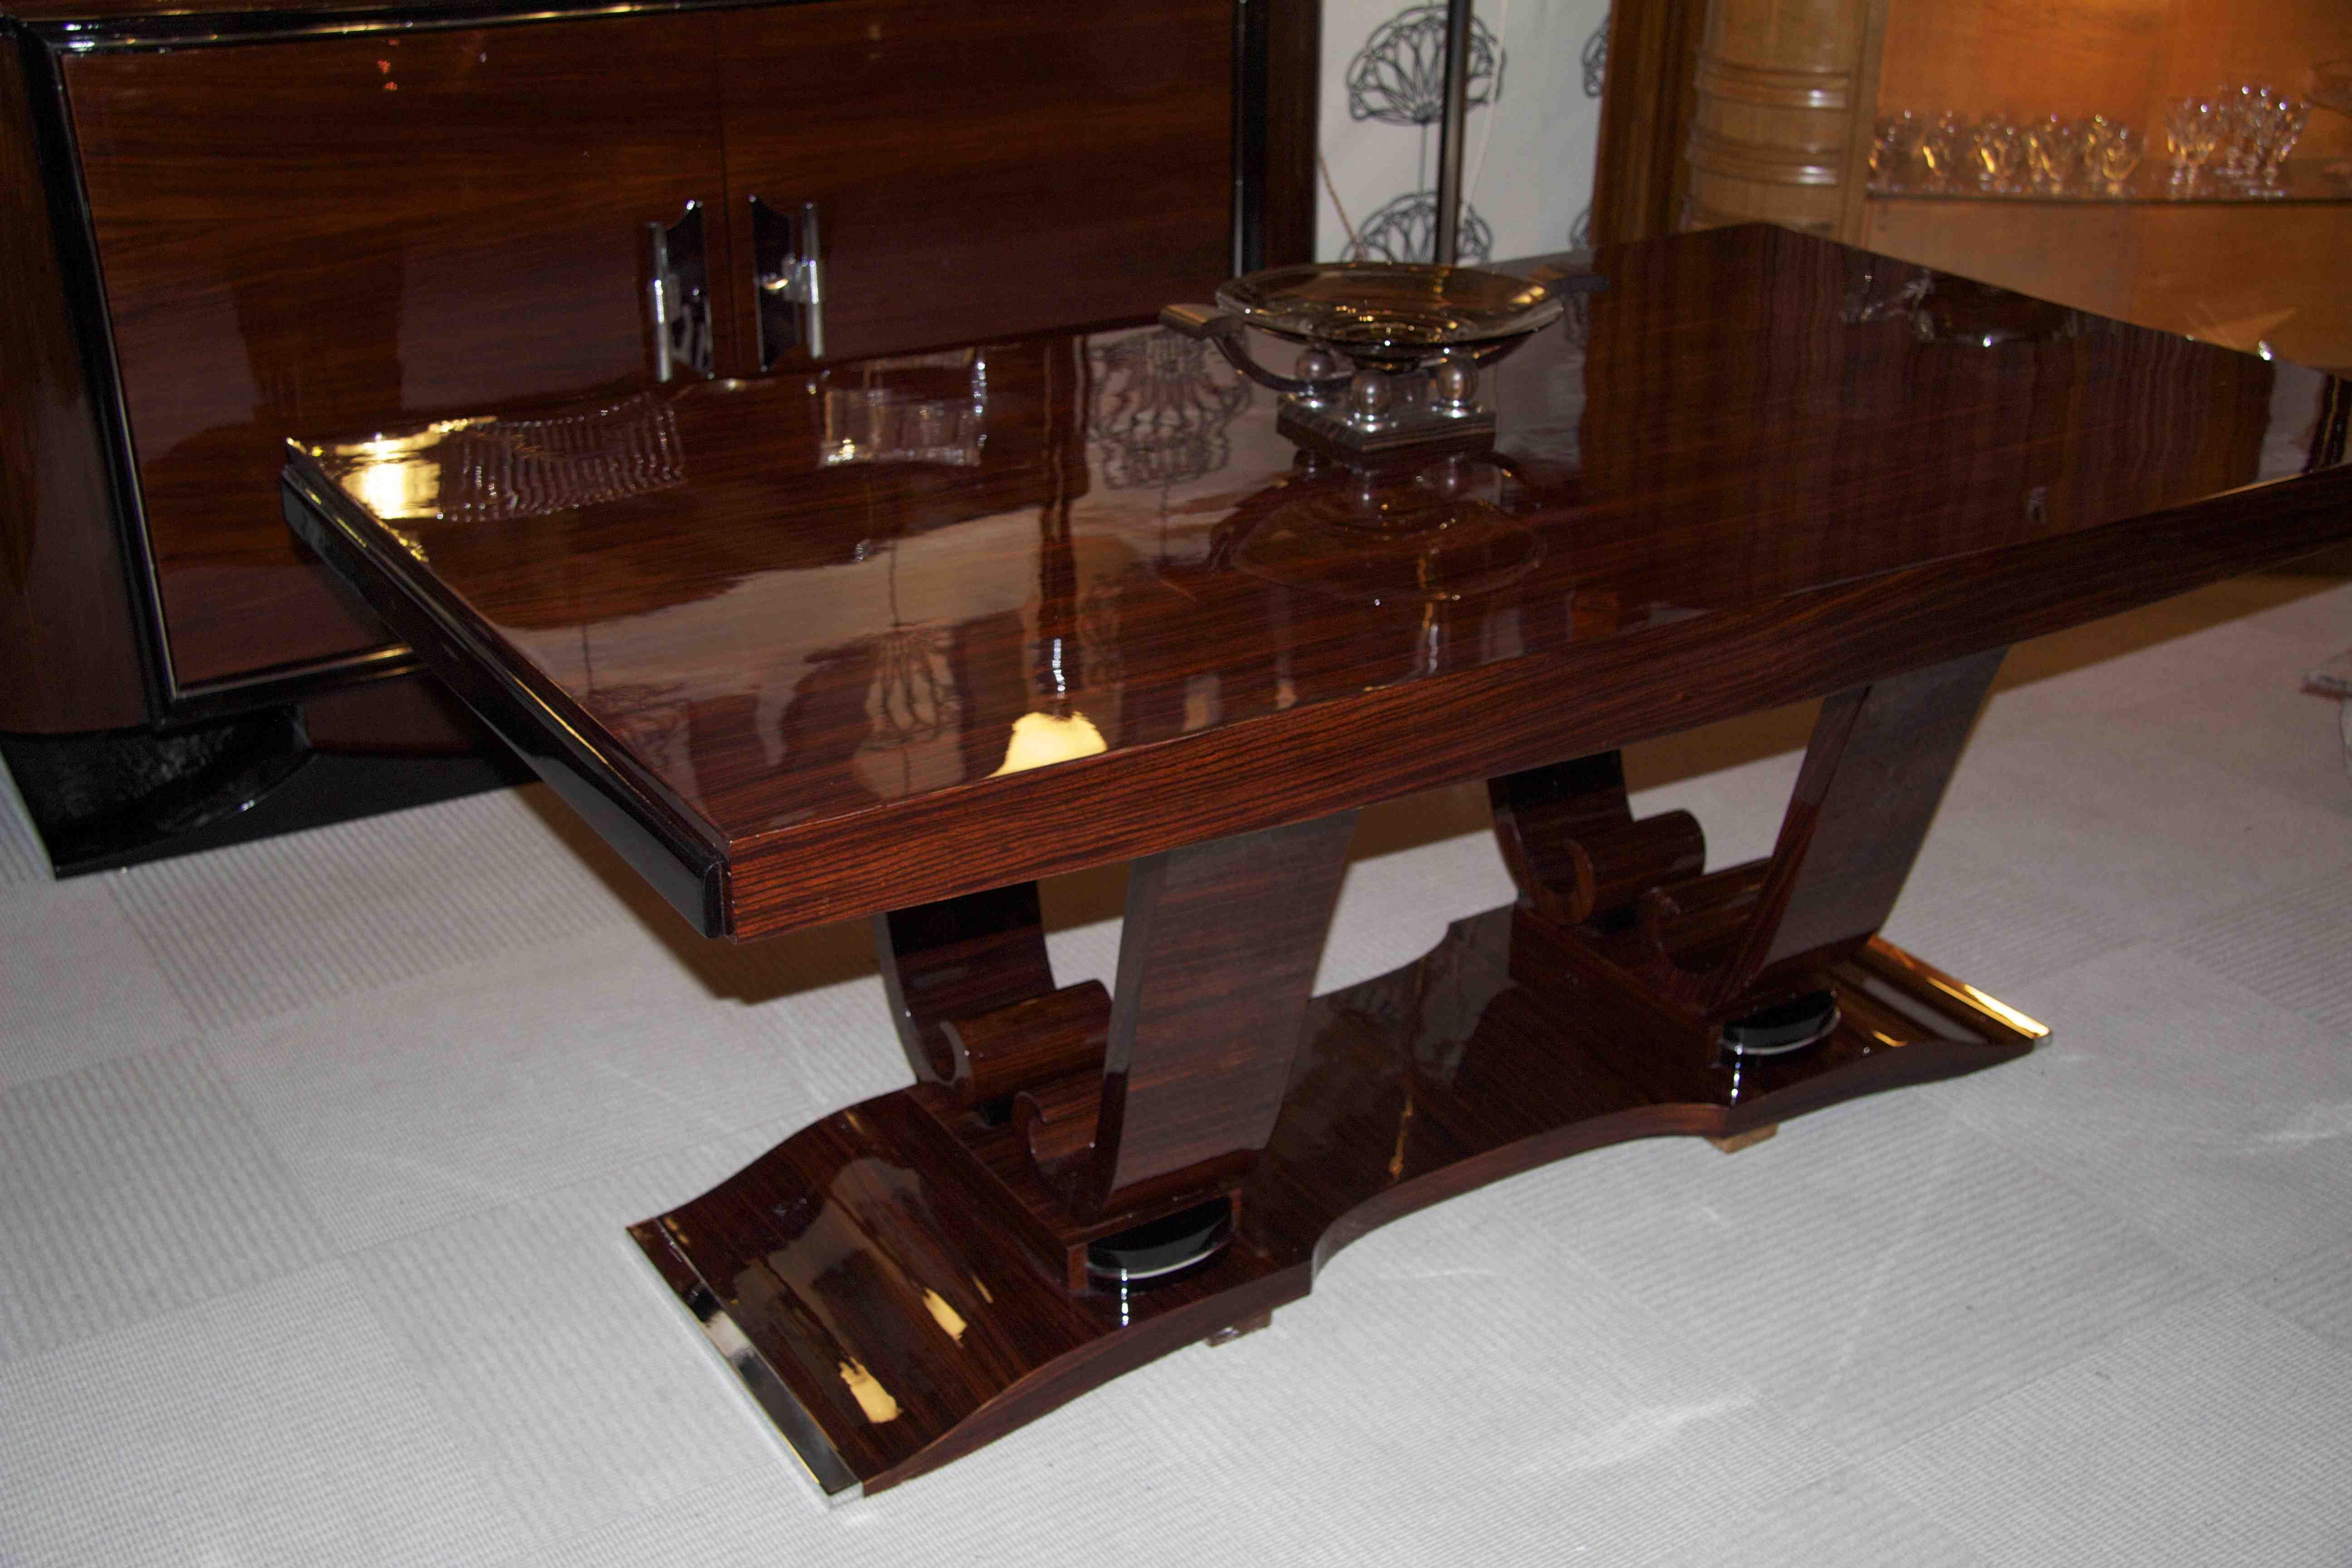 img 3181 esprit art d co vente meubles art d co 1930 bauhaus art d co enfilade sideboard. Black Bedroom Furniture Sets. Home Design Ideas